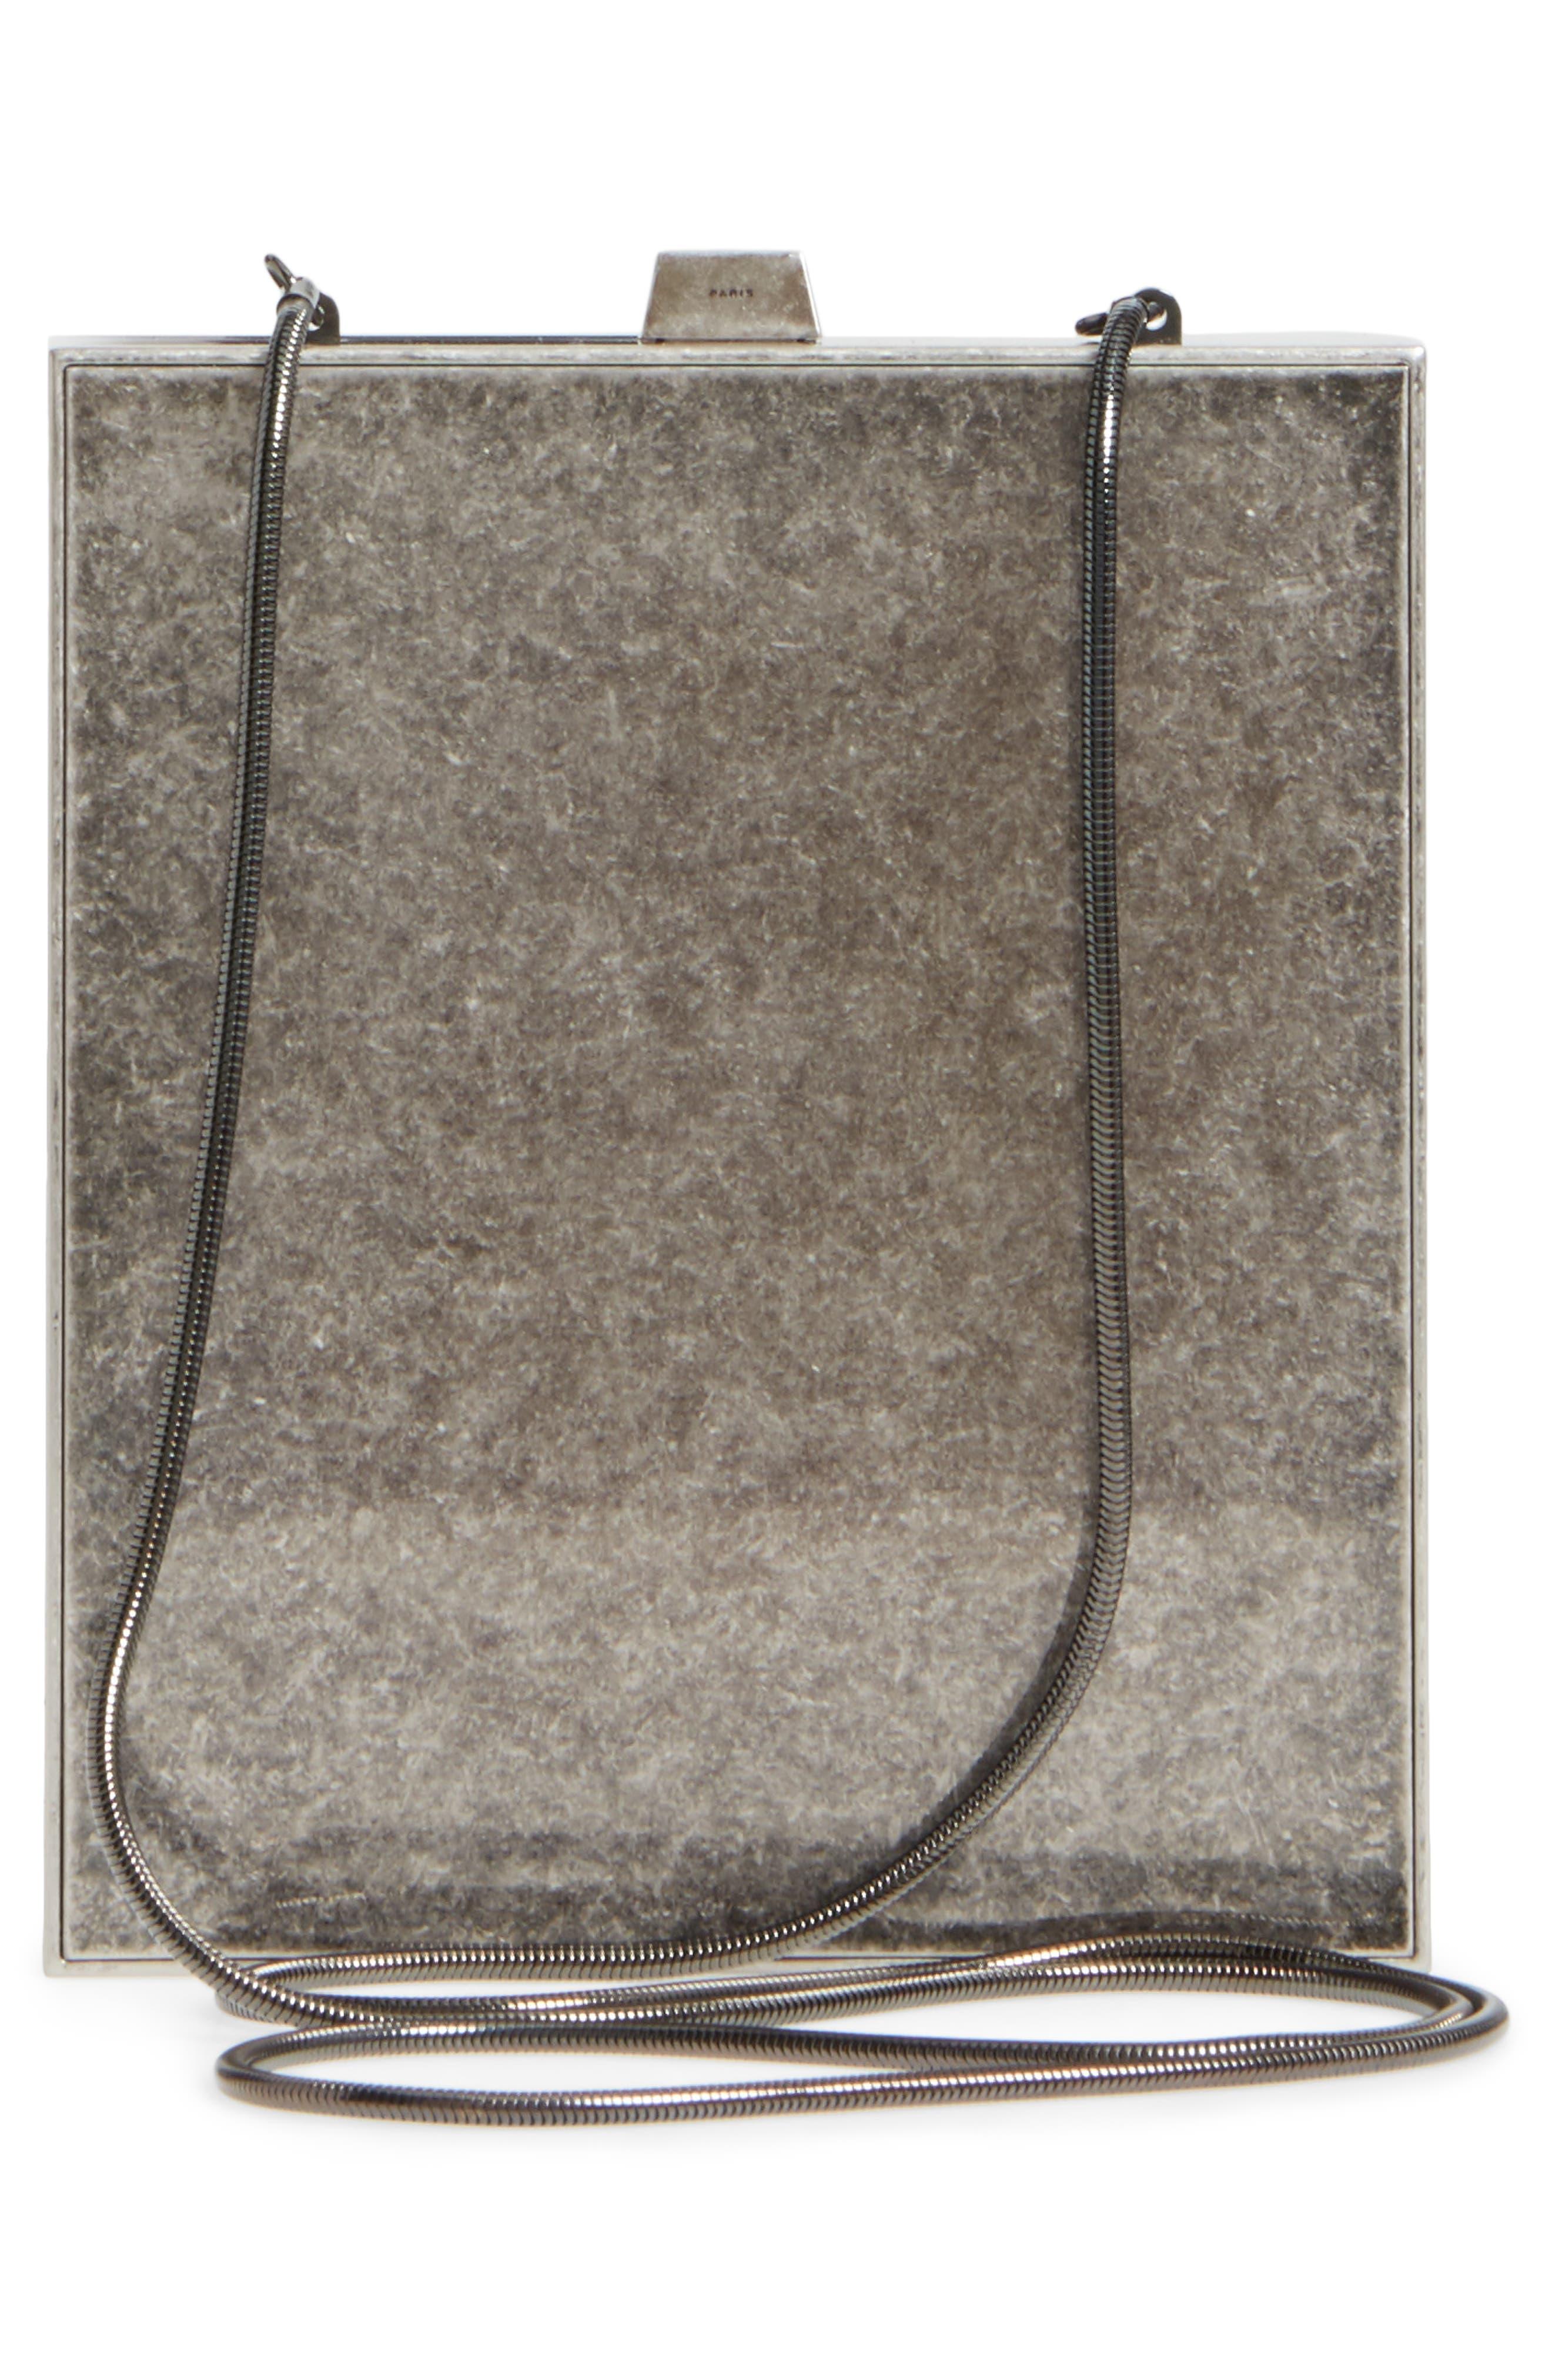 Tuxedo Metal Clutch,                             Alternate thumbnail 3, color,                             040